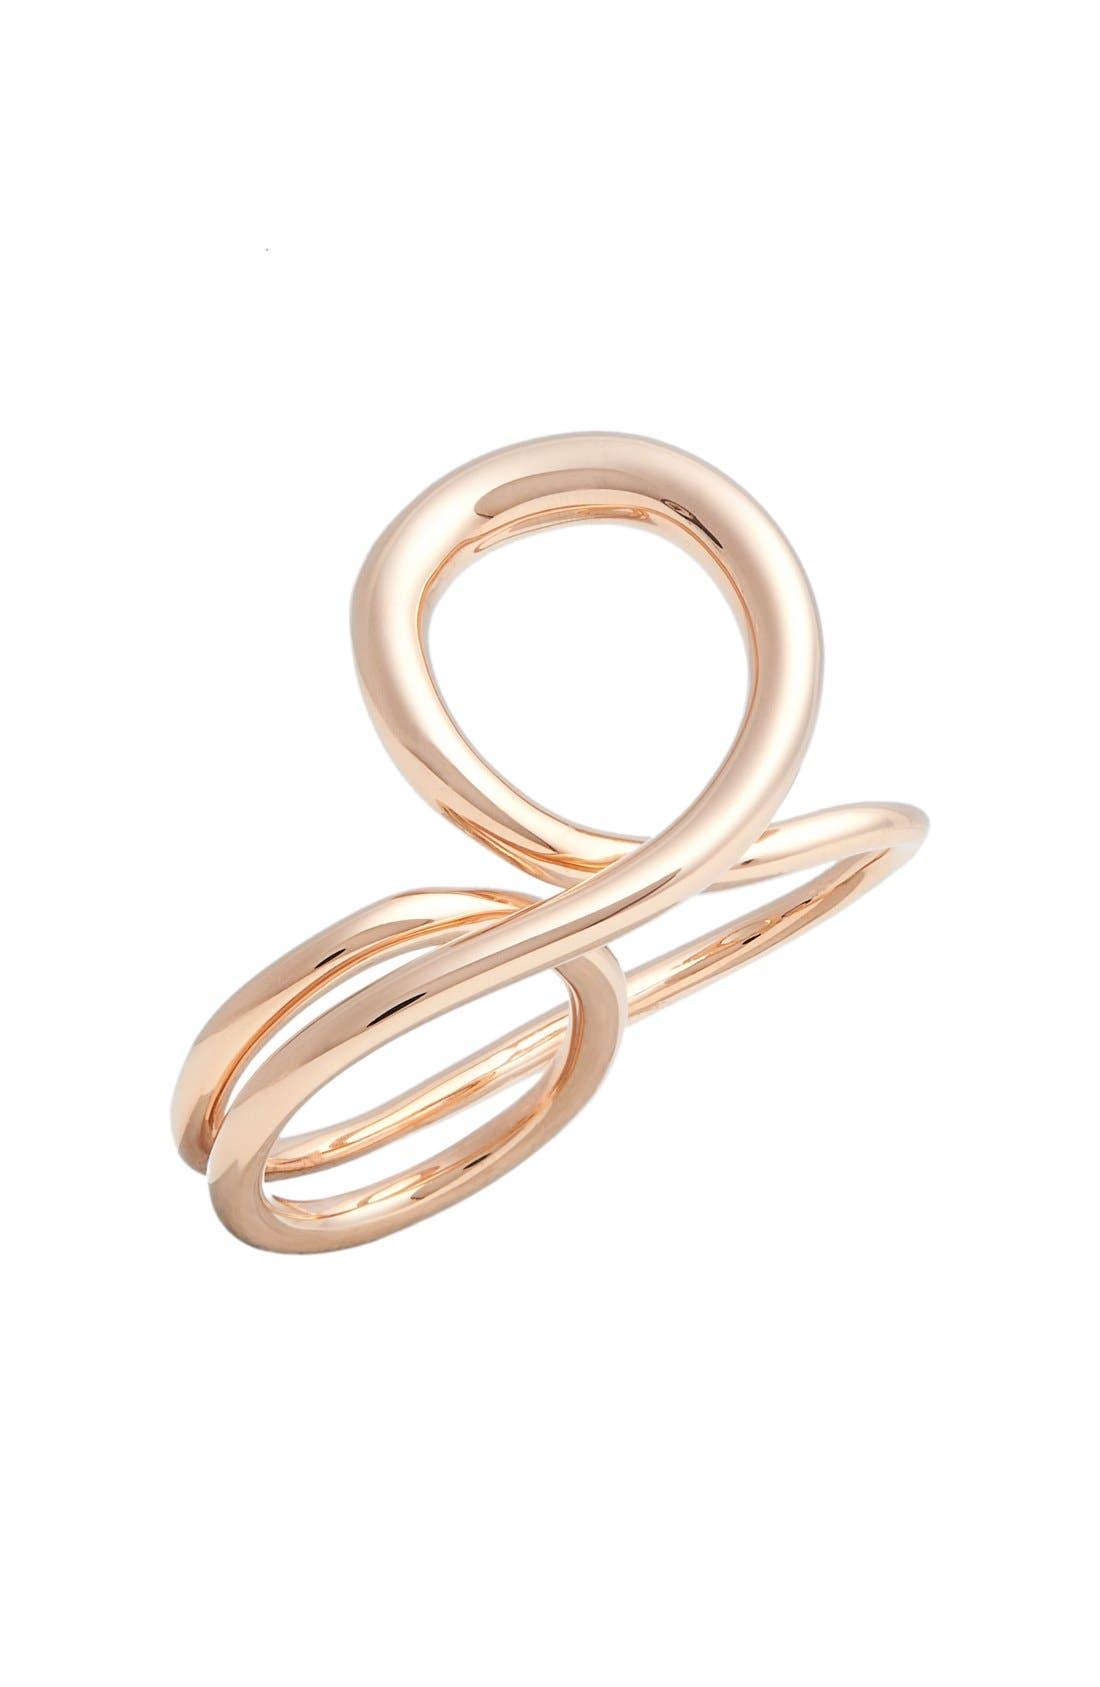 'Gamma Trip' Vermeil Two-Finger Ring,                             Main thumbnail 1, color,                             PINK VERMEIL